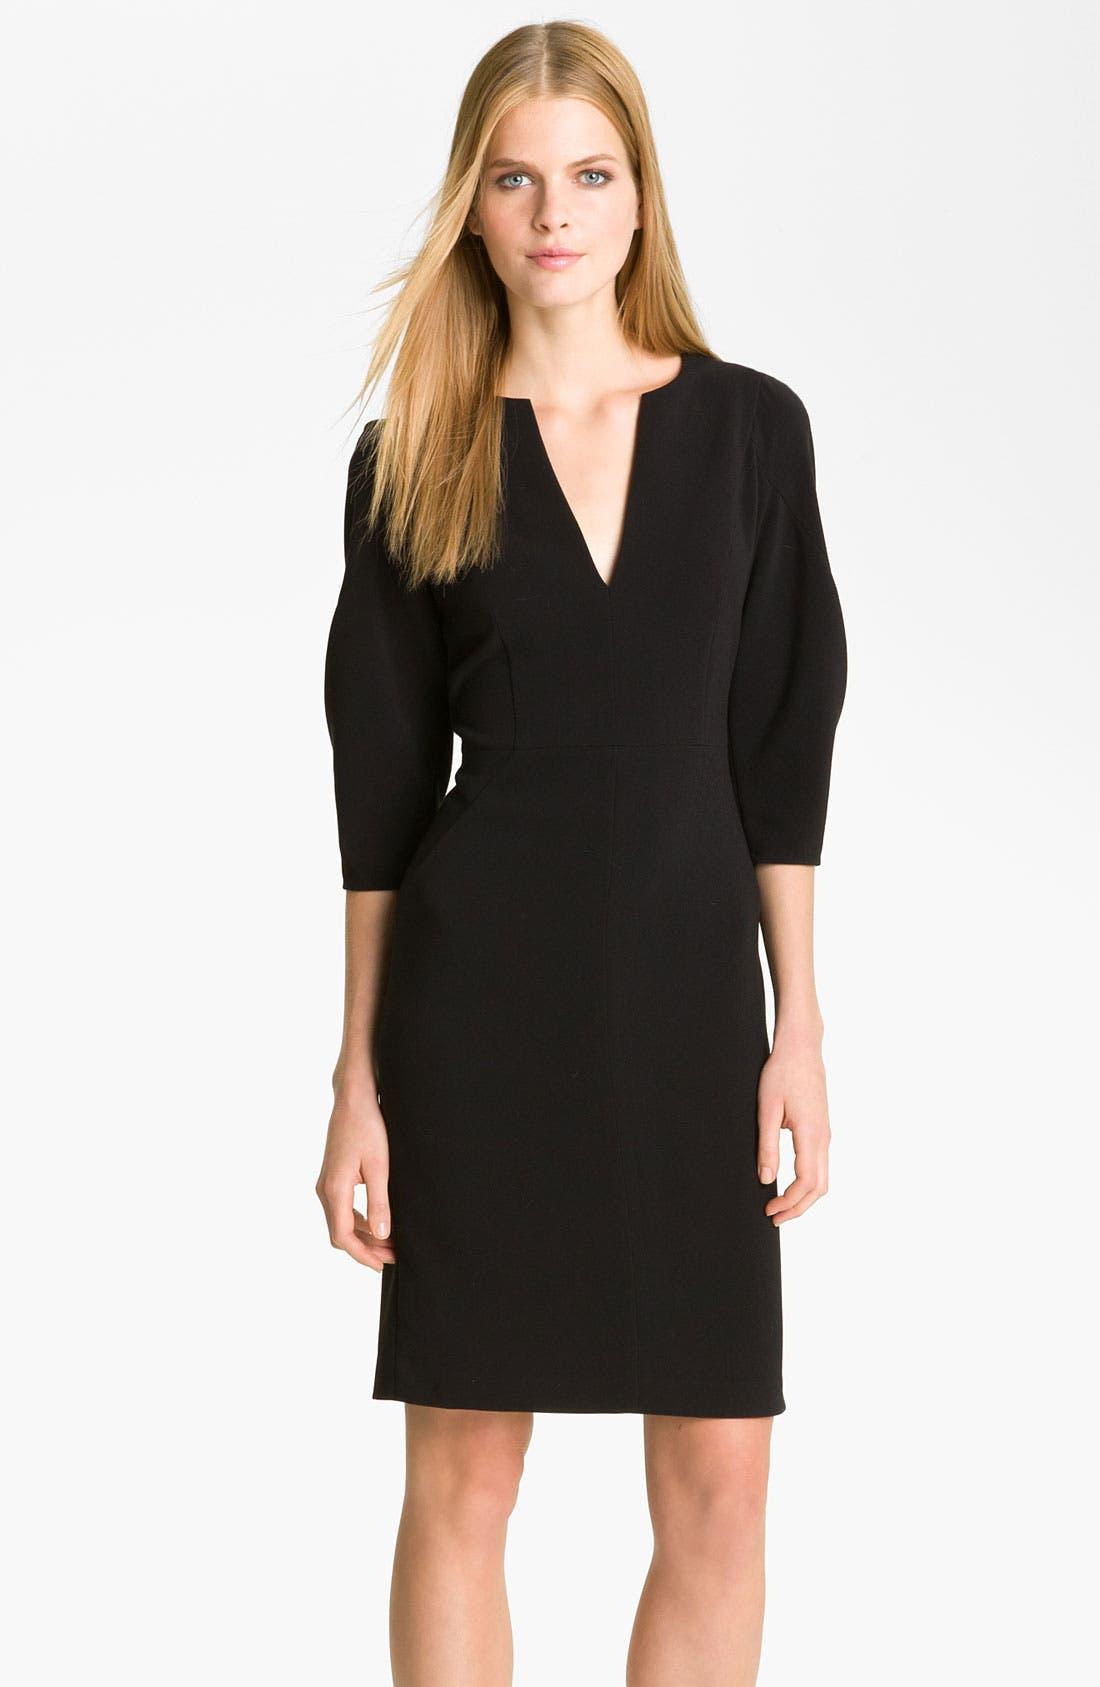 Alternate Image 1 Selected - Rachel Roy Sheath Dress & Accessories